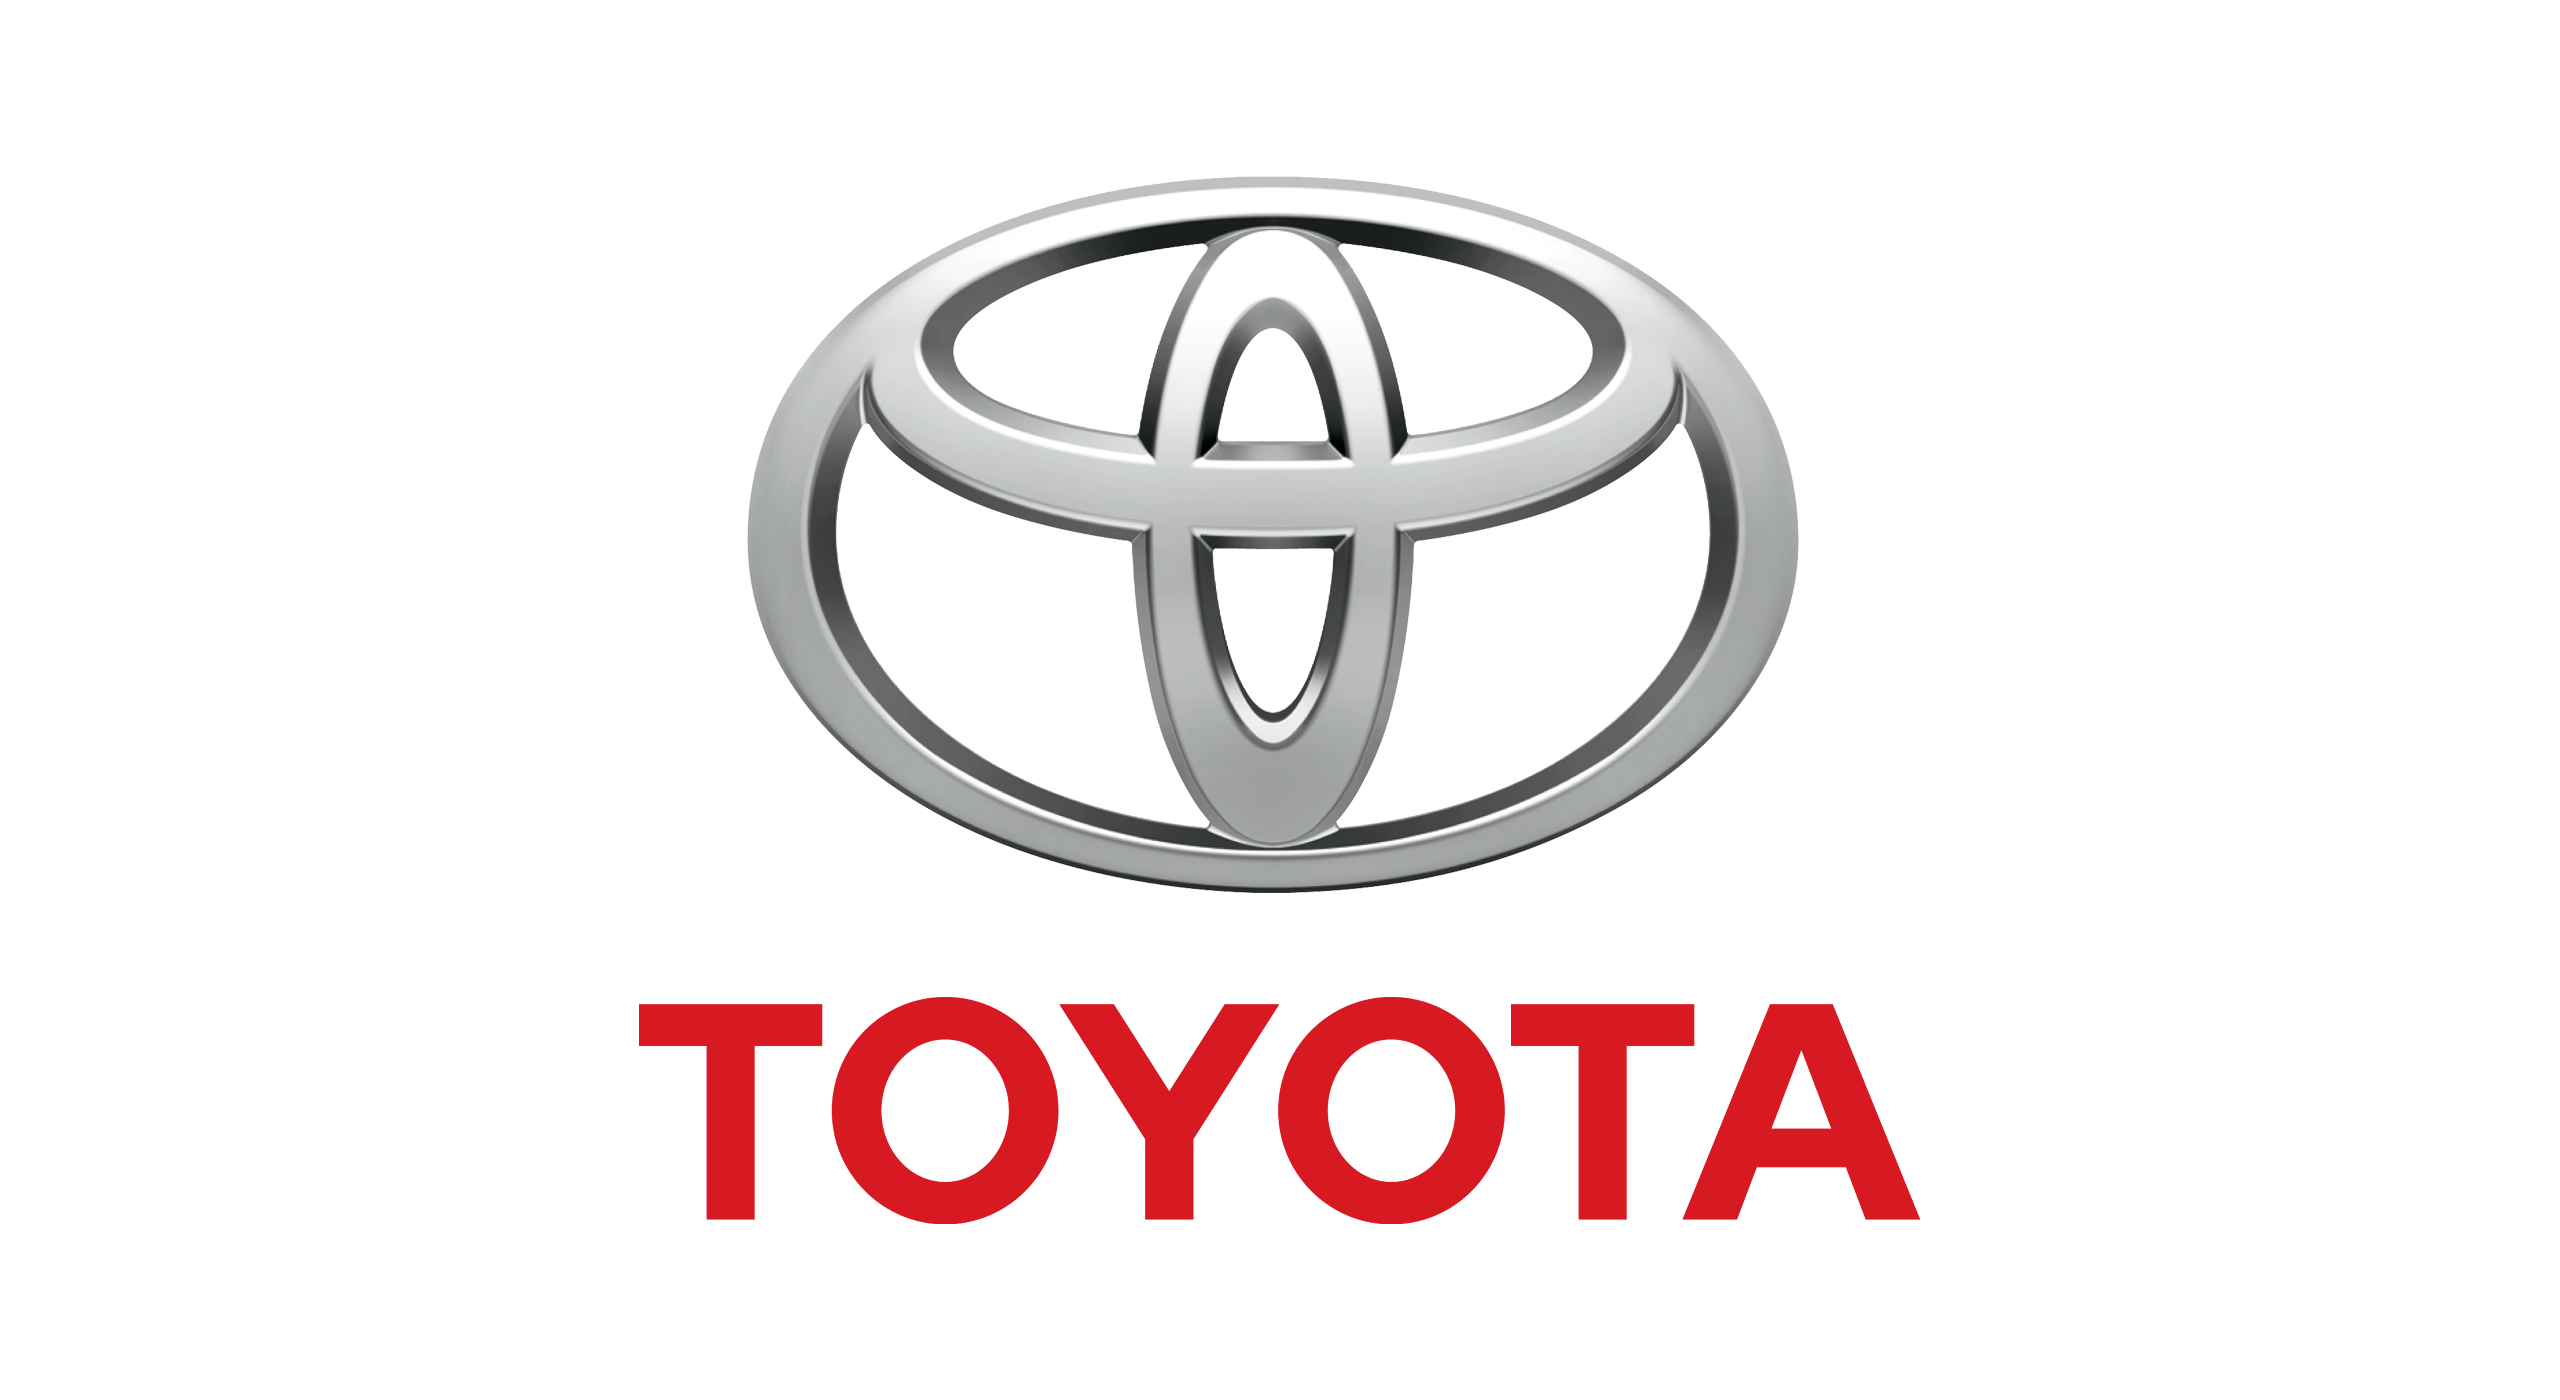 Toyota Logo Png image #20206